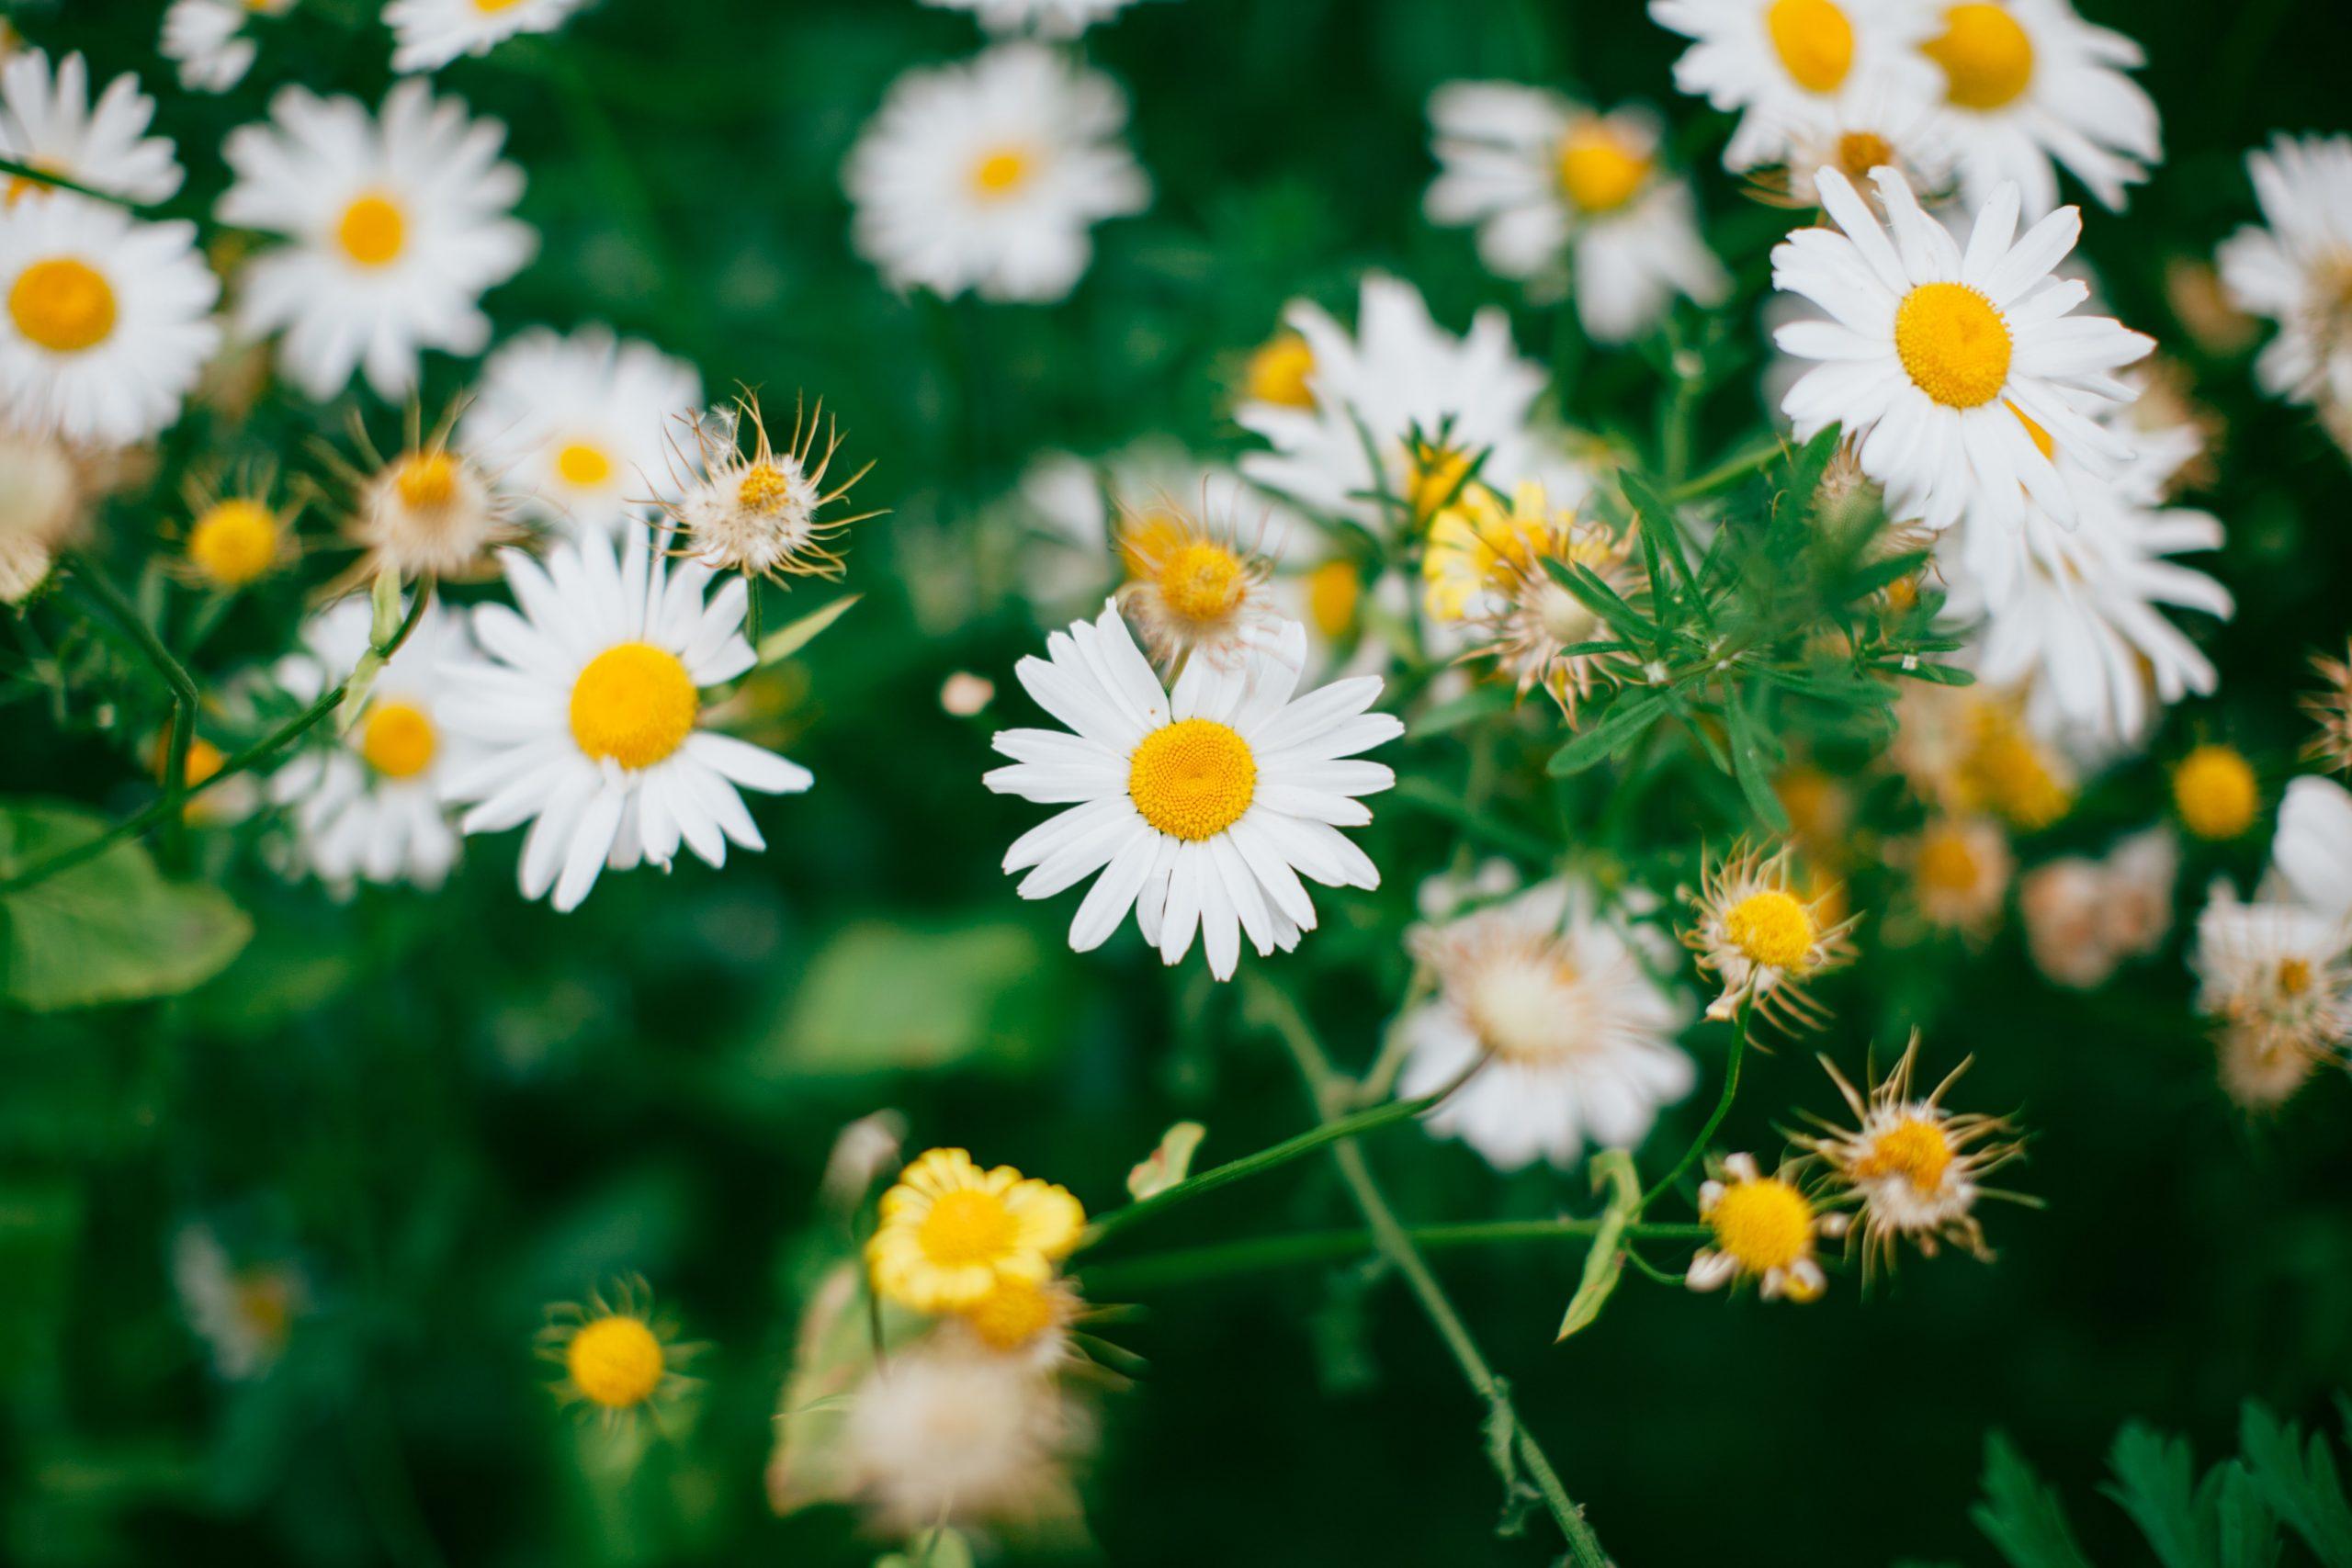 shallow shot of white daisies